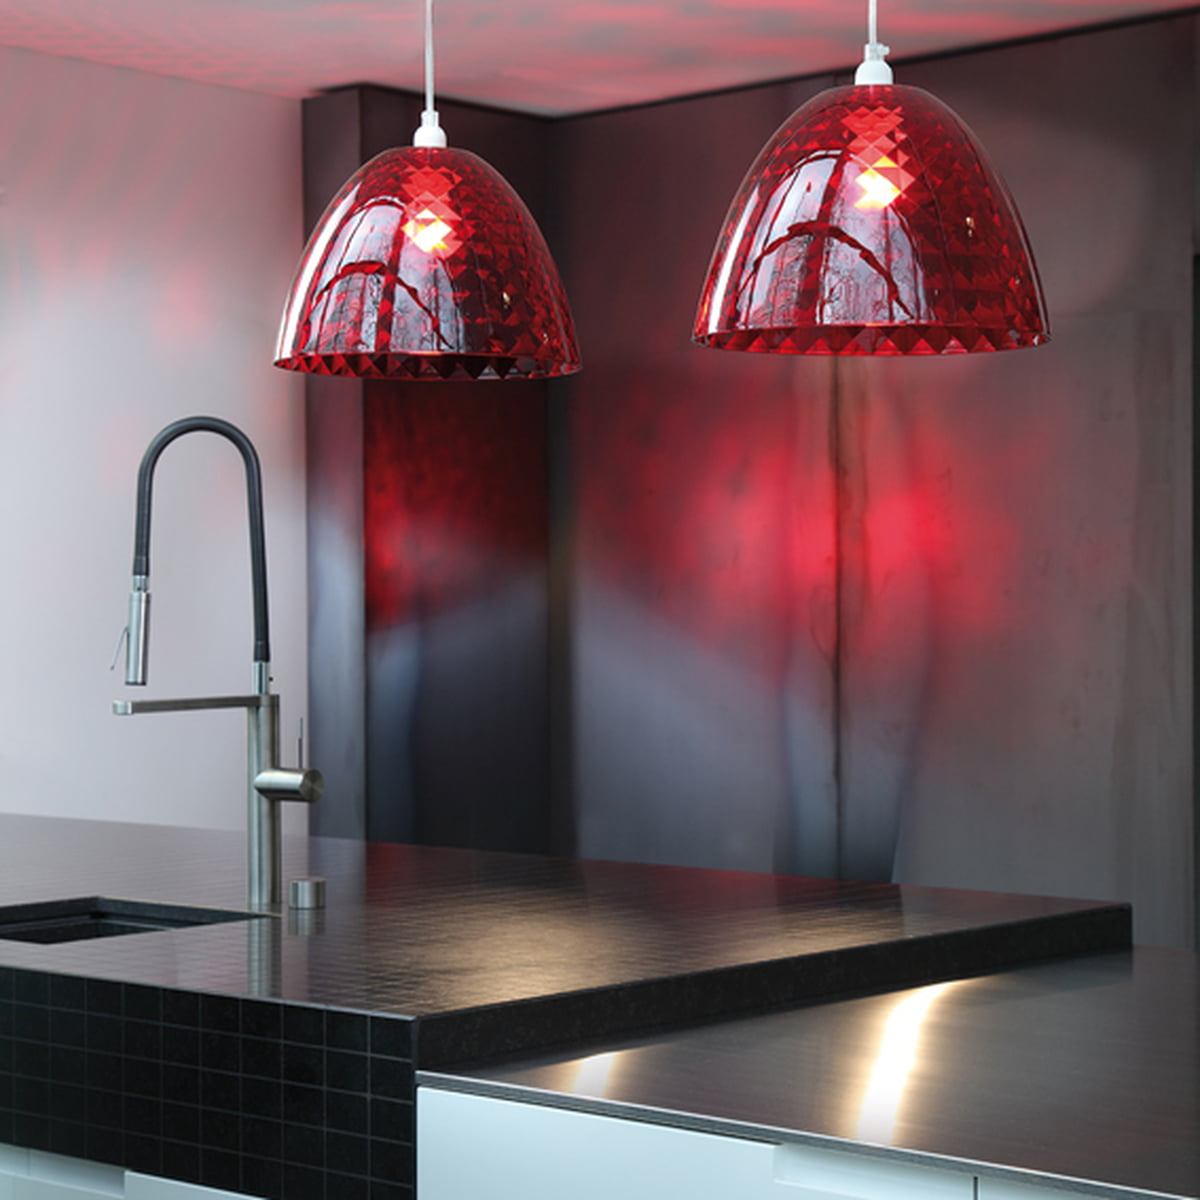 Koziol Hanglamp Stella M.Koziol Stella S Pendant Lamp Transparent Red